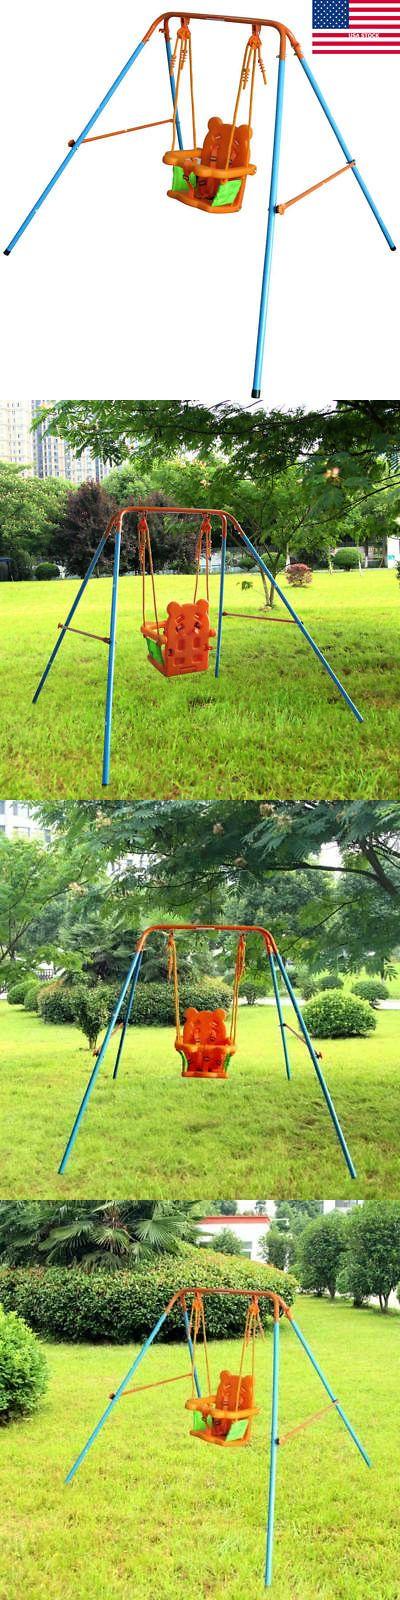 Baby Swings 2990: Safety Swing Set Baby Toddler Kids Outdoor Backyard Swingset Folding Playset Us -> BUY IT NOW ONLY: $47.59 on eBay!